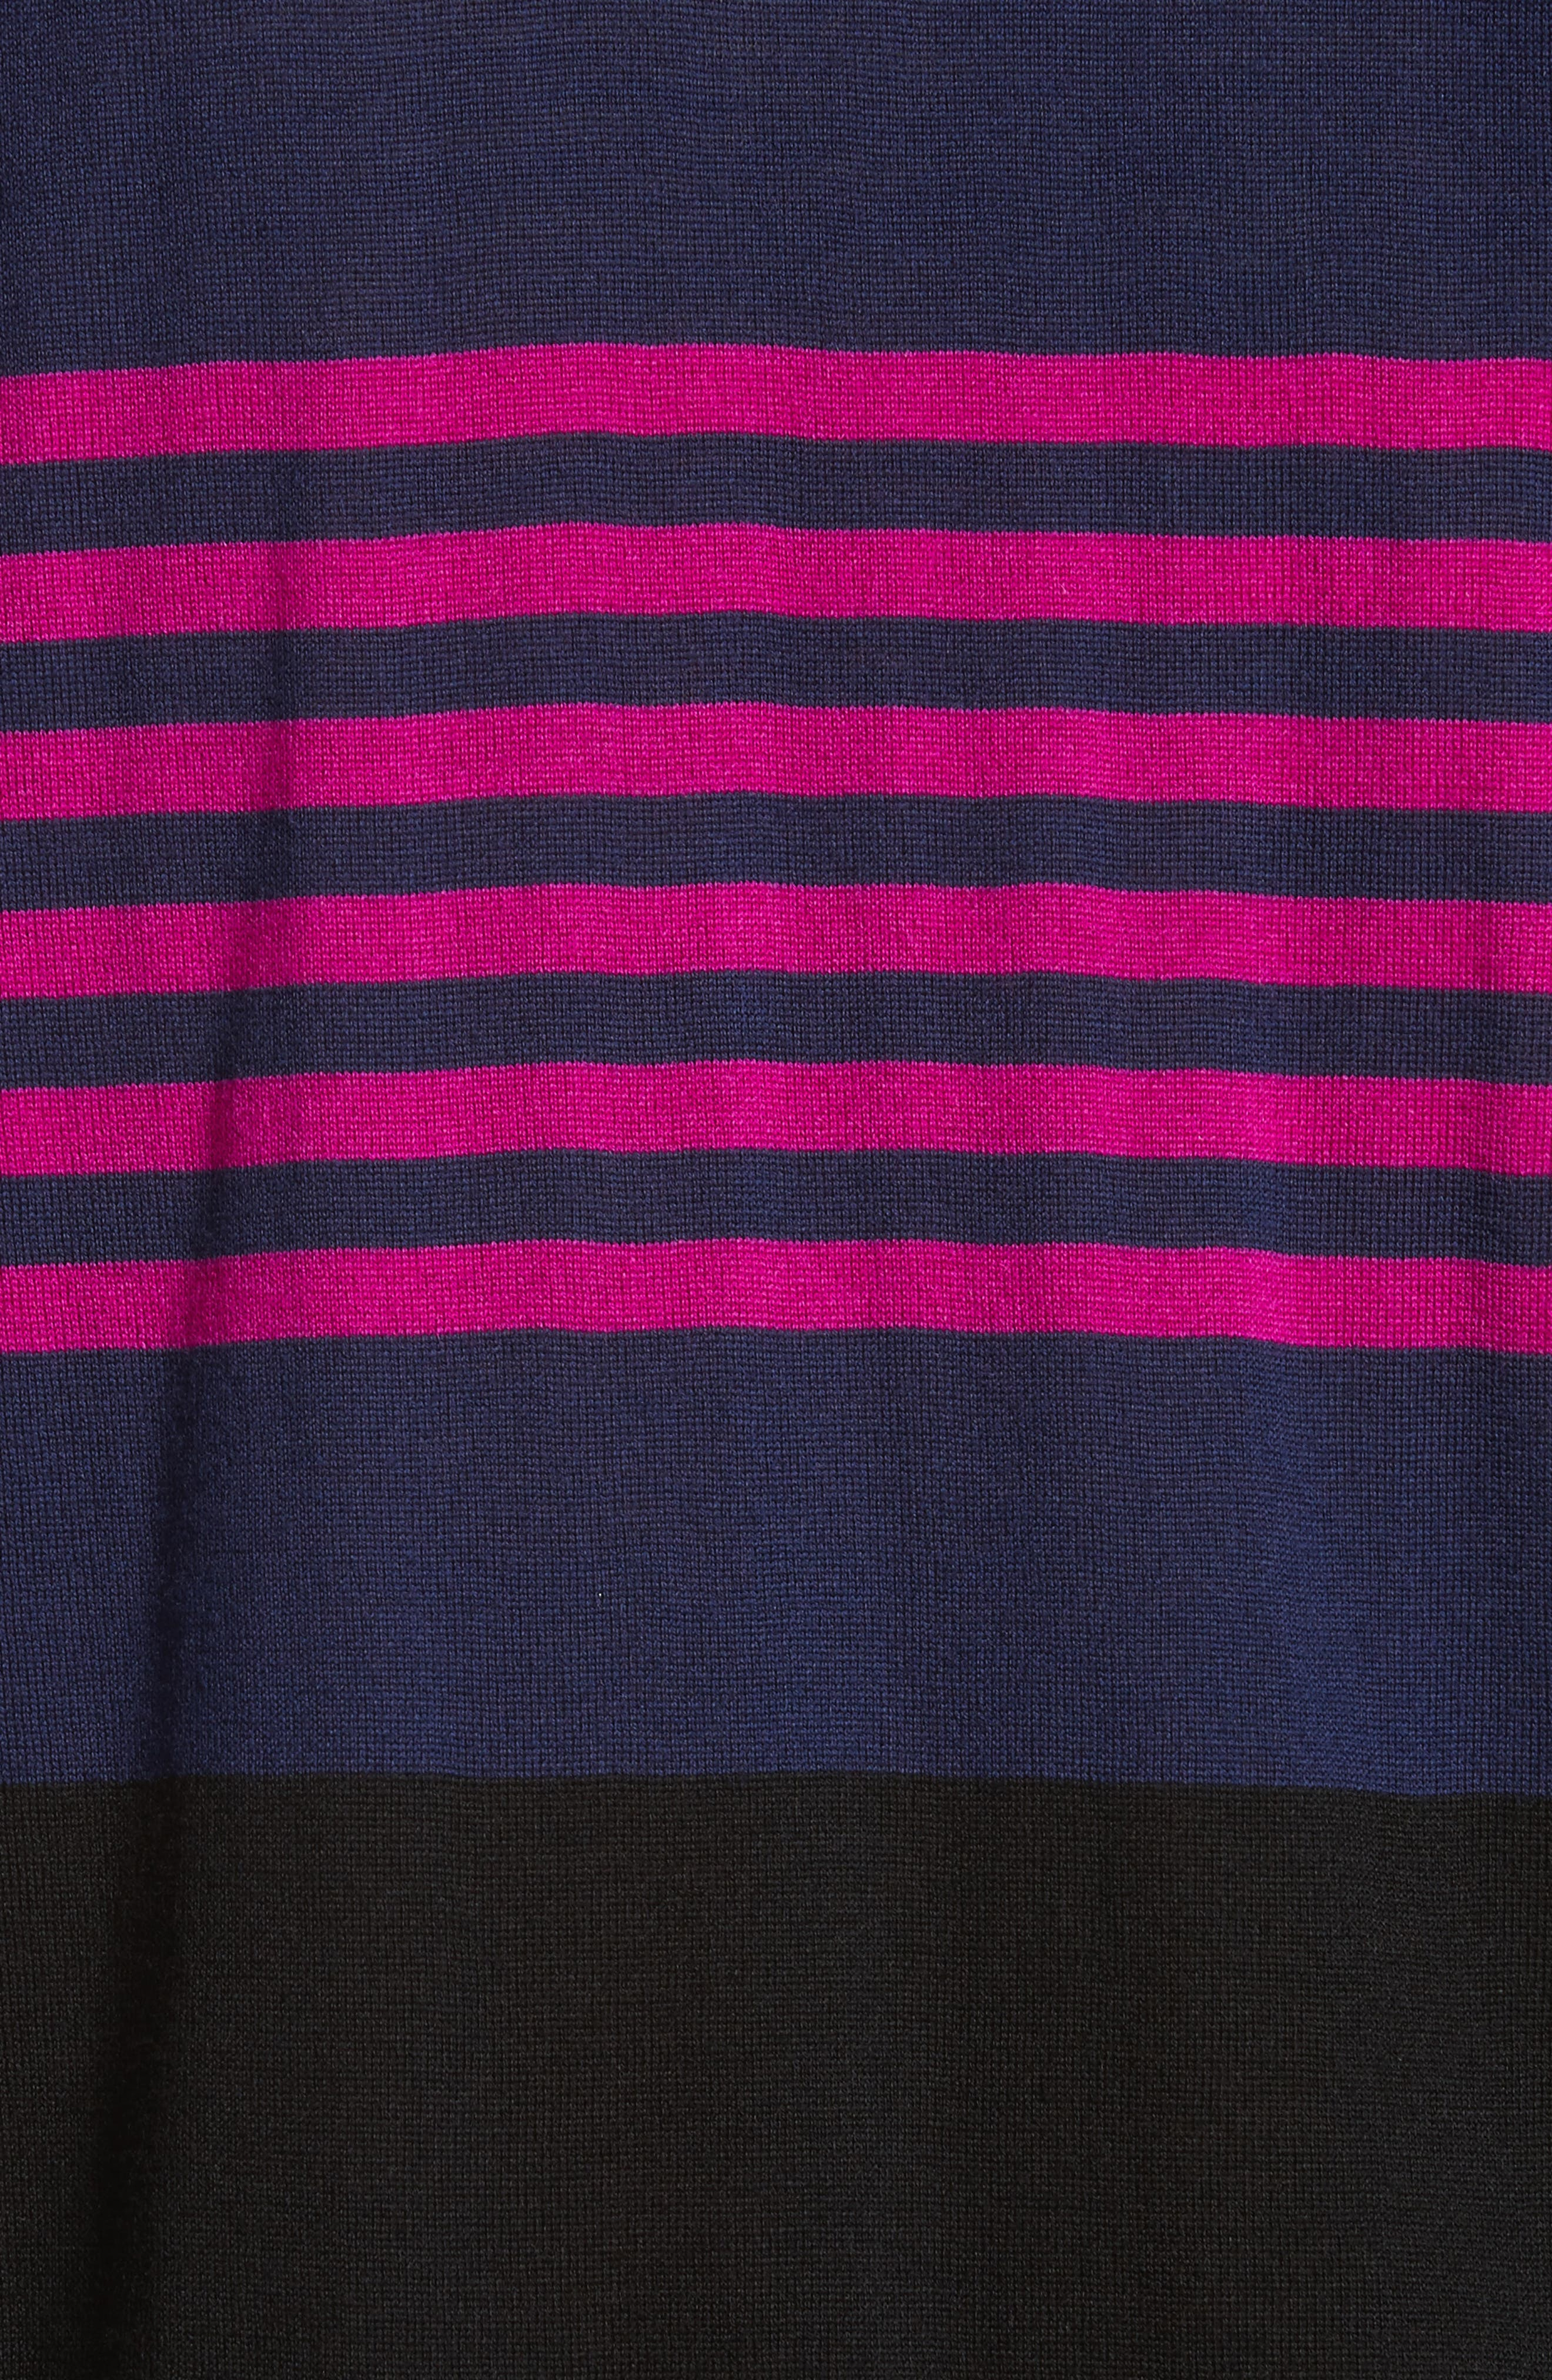 Stripe Merino Wool Crewneck Sweater,                             Alternate thumbnail 9, color,